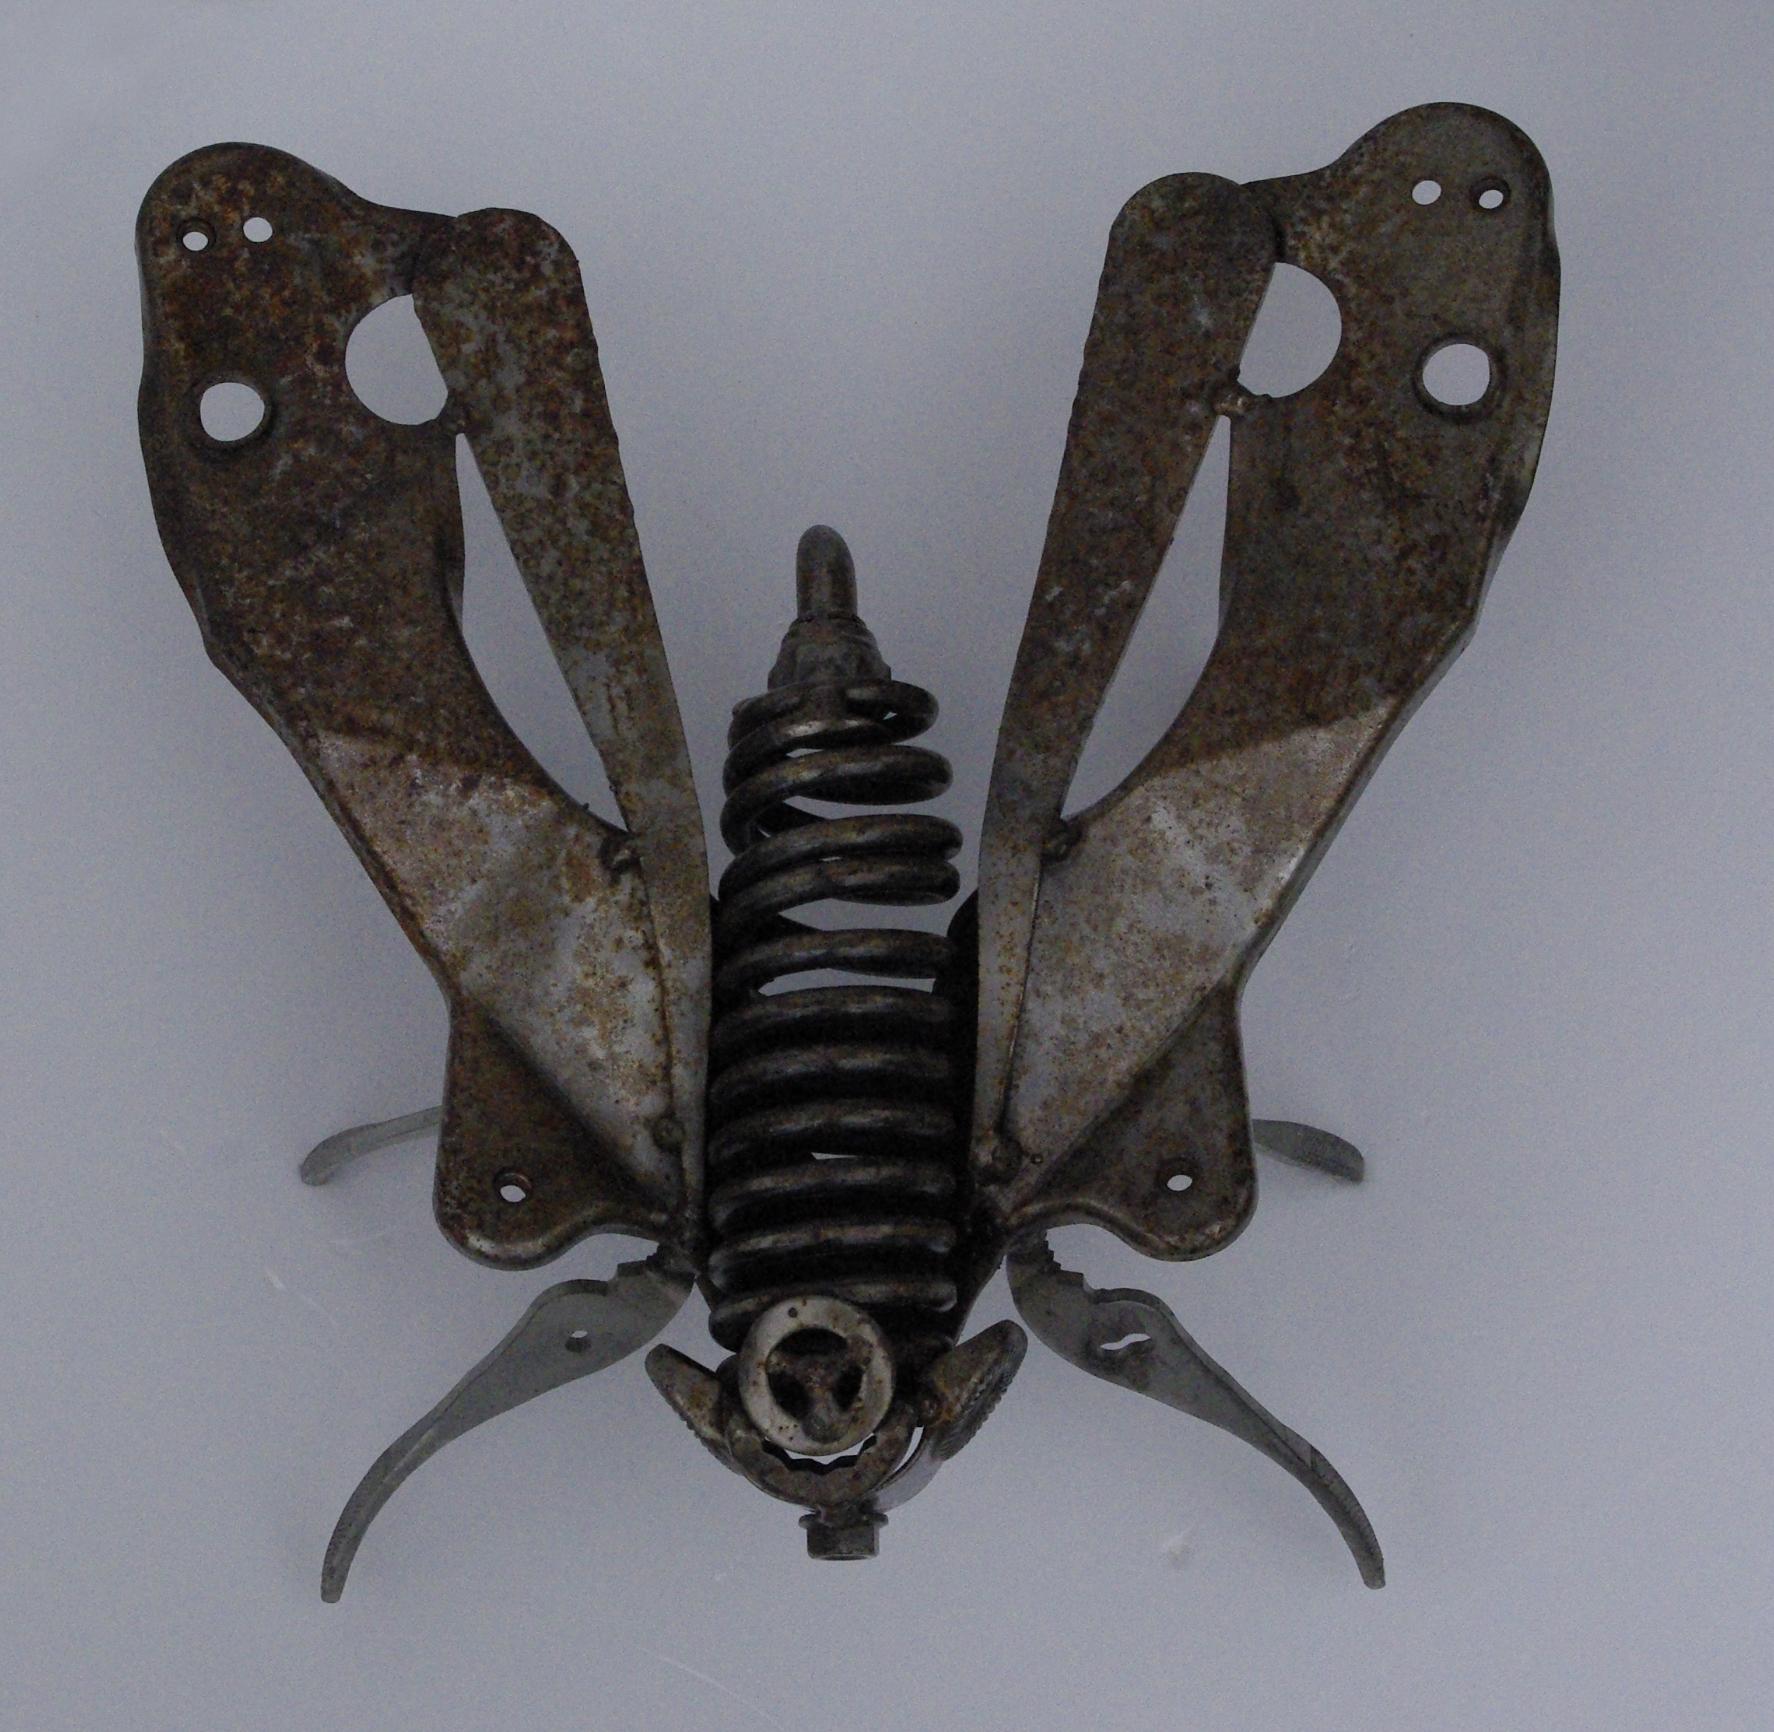 mosca.1 | 2012